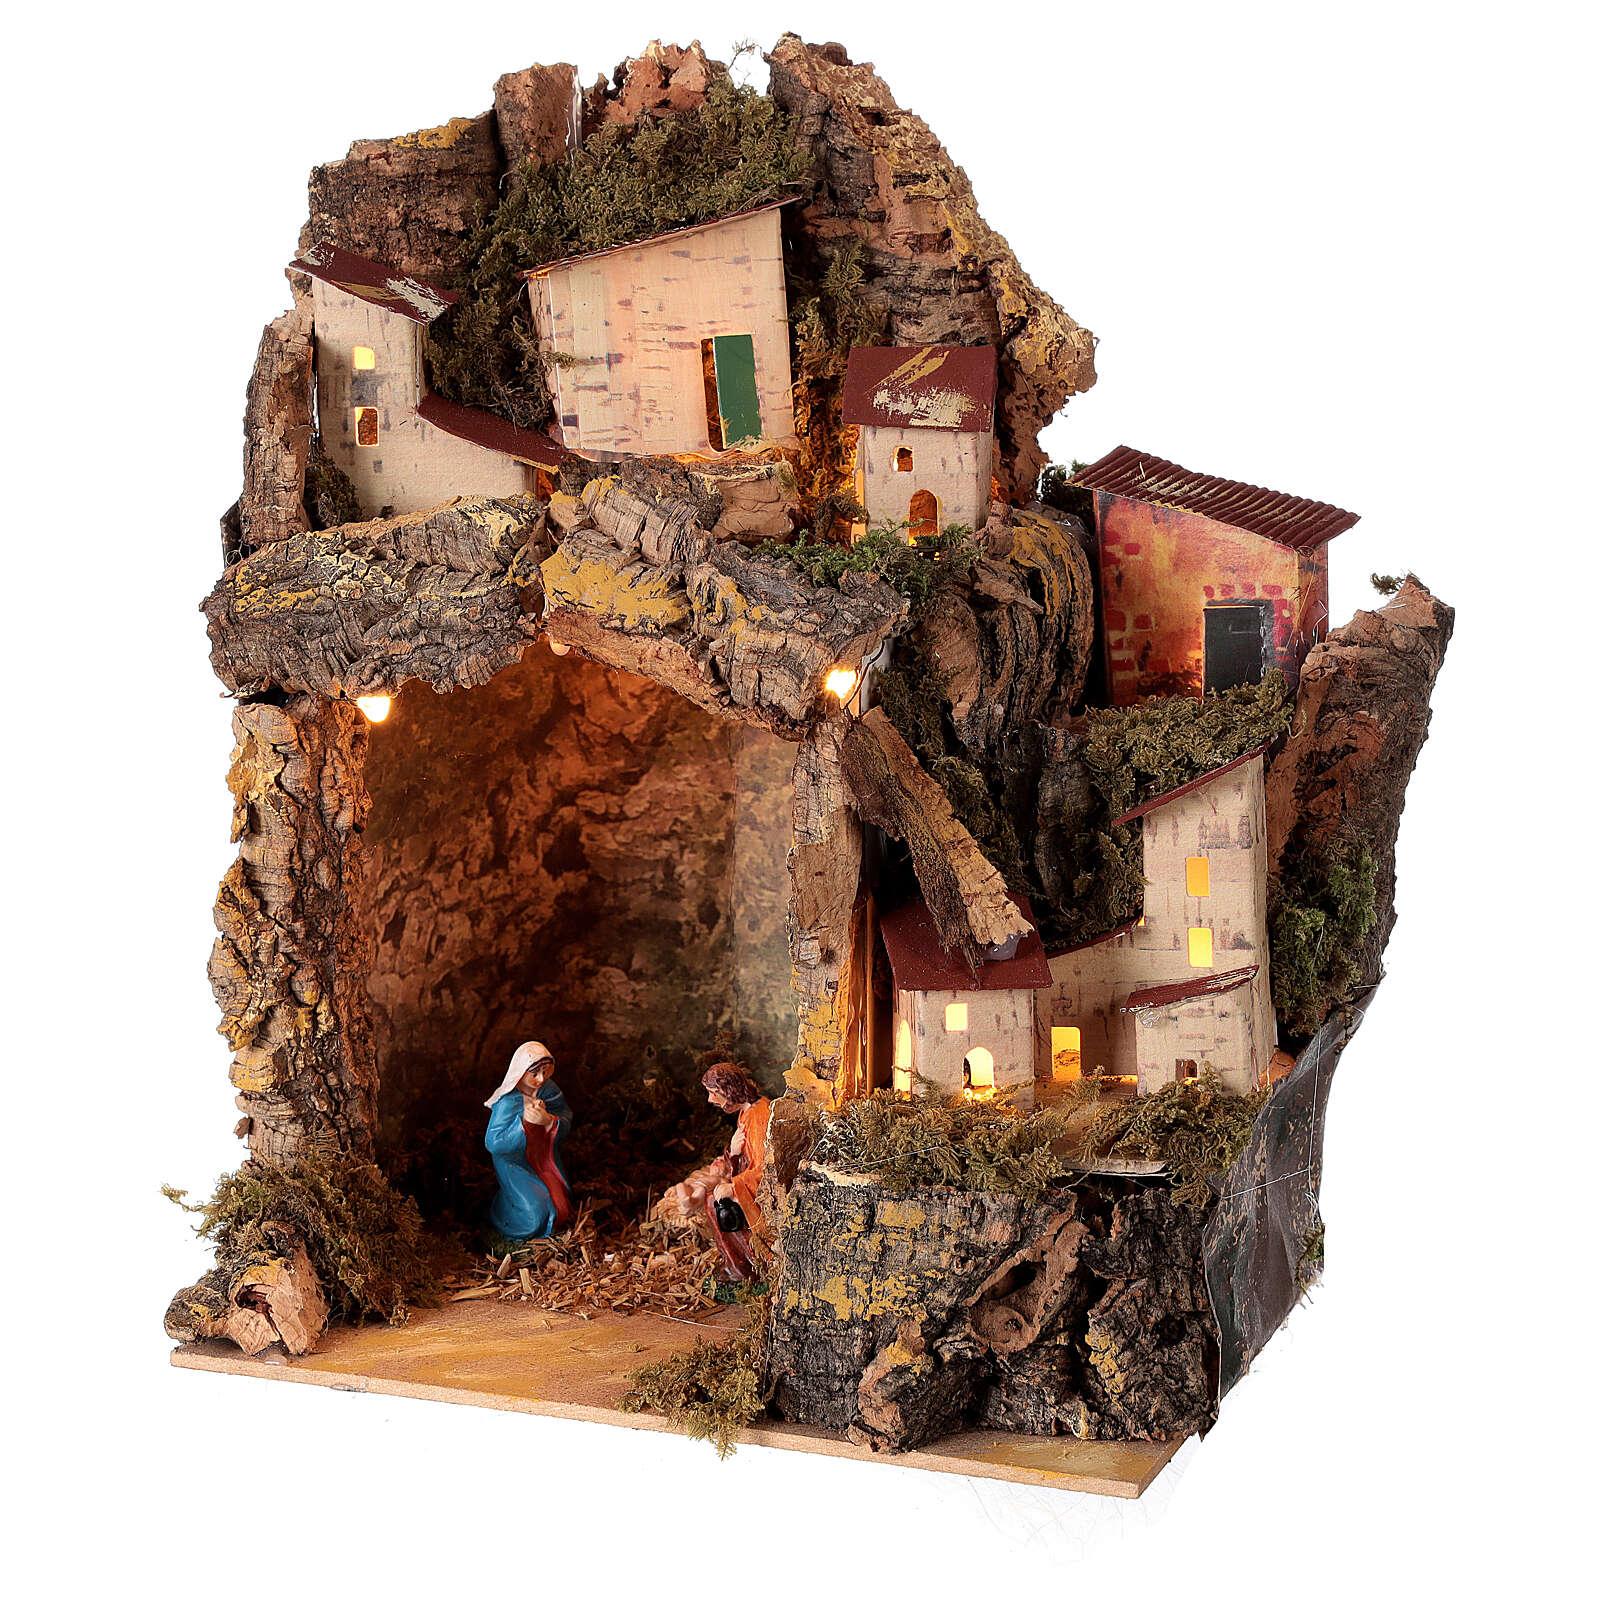 Nativity scene with illuminated village 25x20x15 cm 6 cm 4